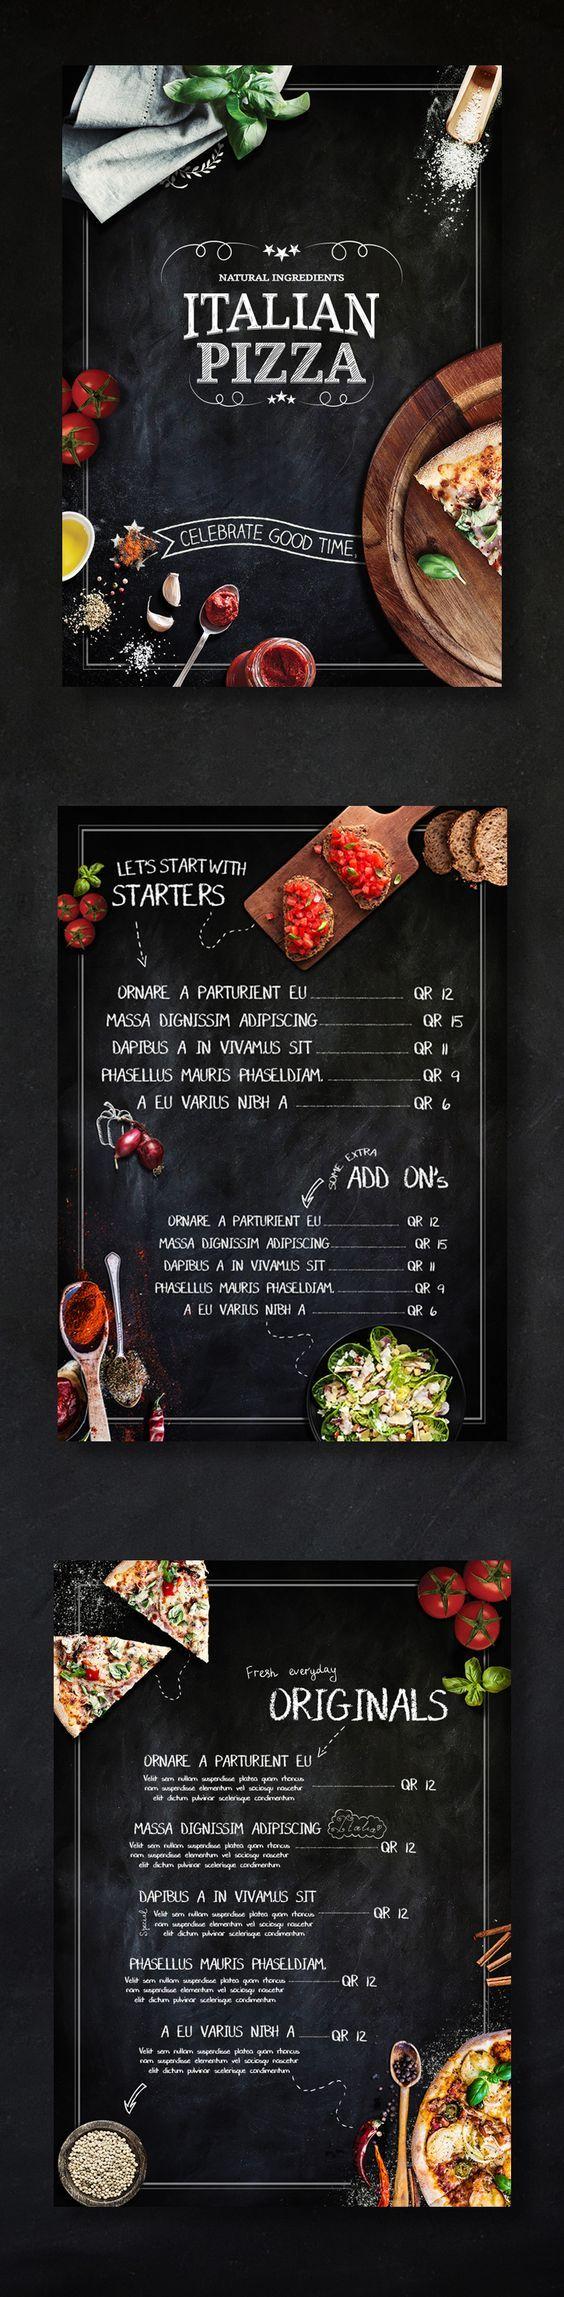 Pizza place menu on Behance                                                                                                                                                     More